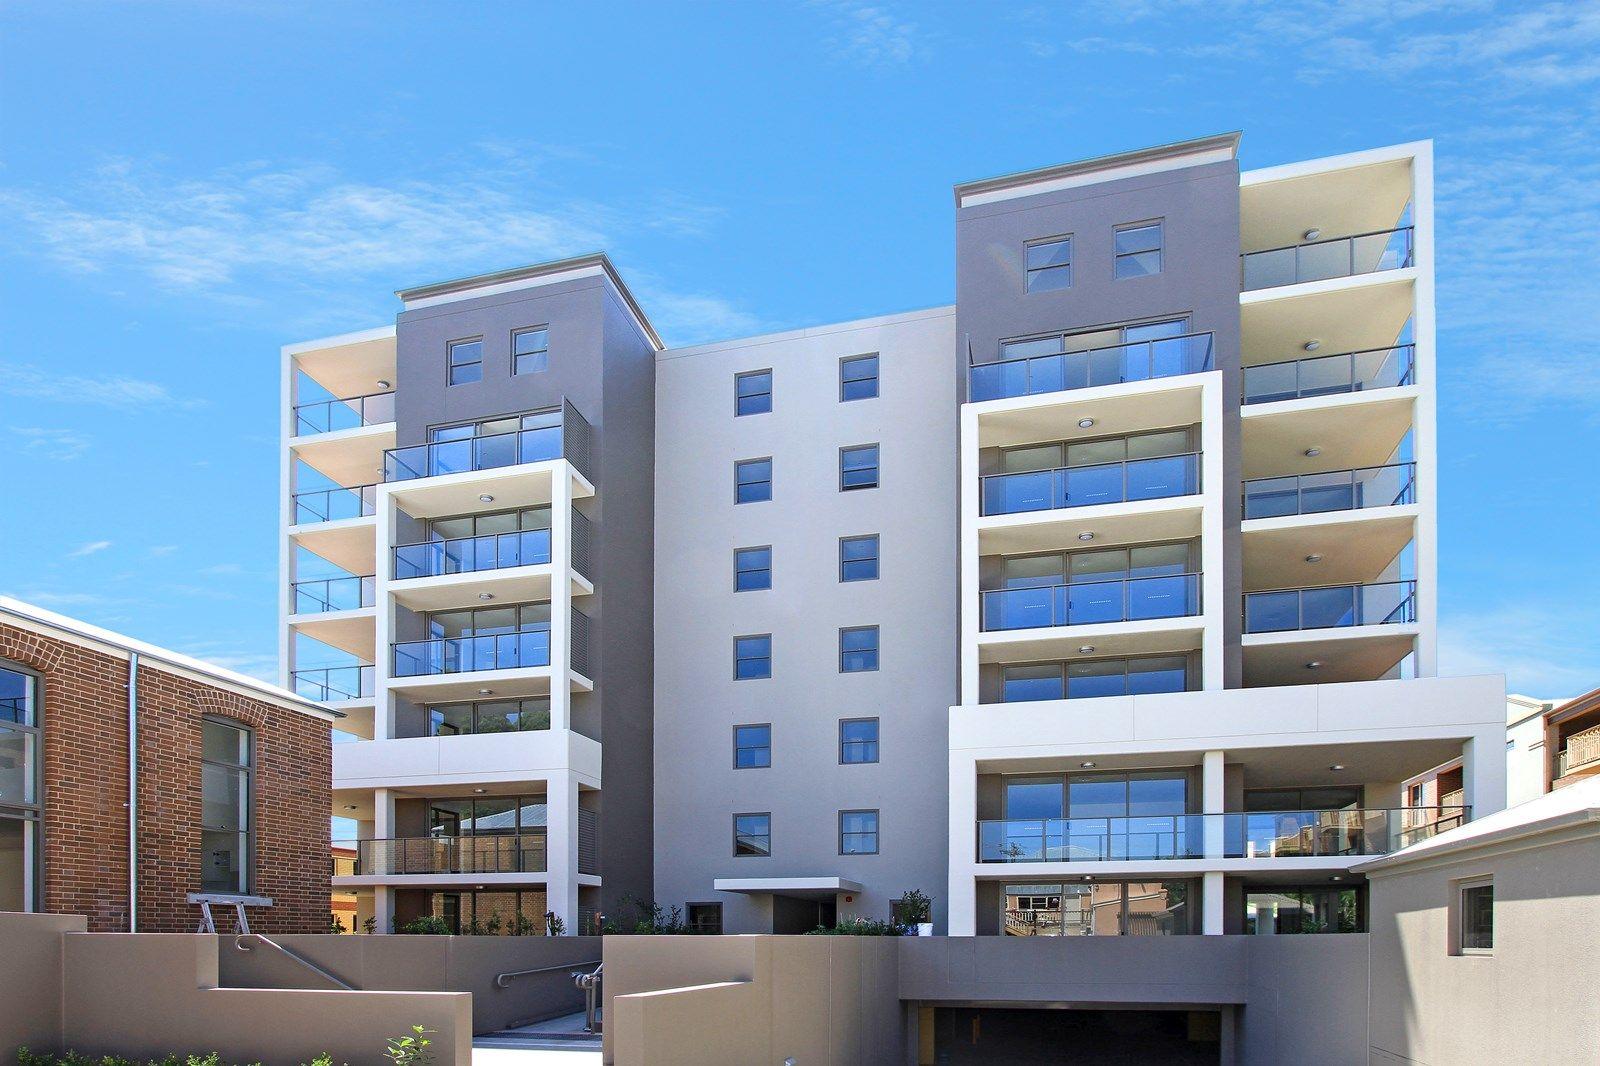 11/88 Smith Street, Wollongong NSW 2500, Image 7